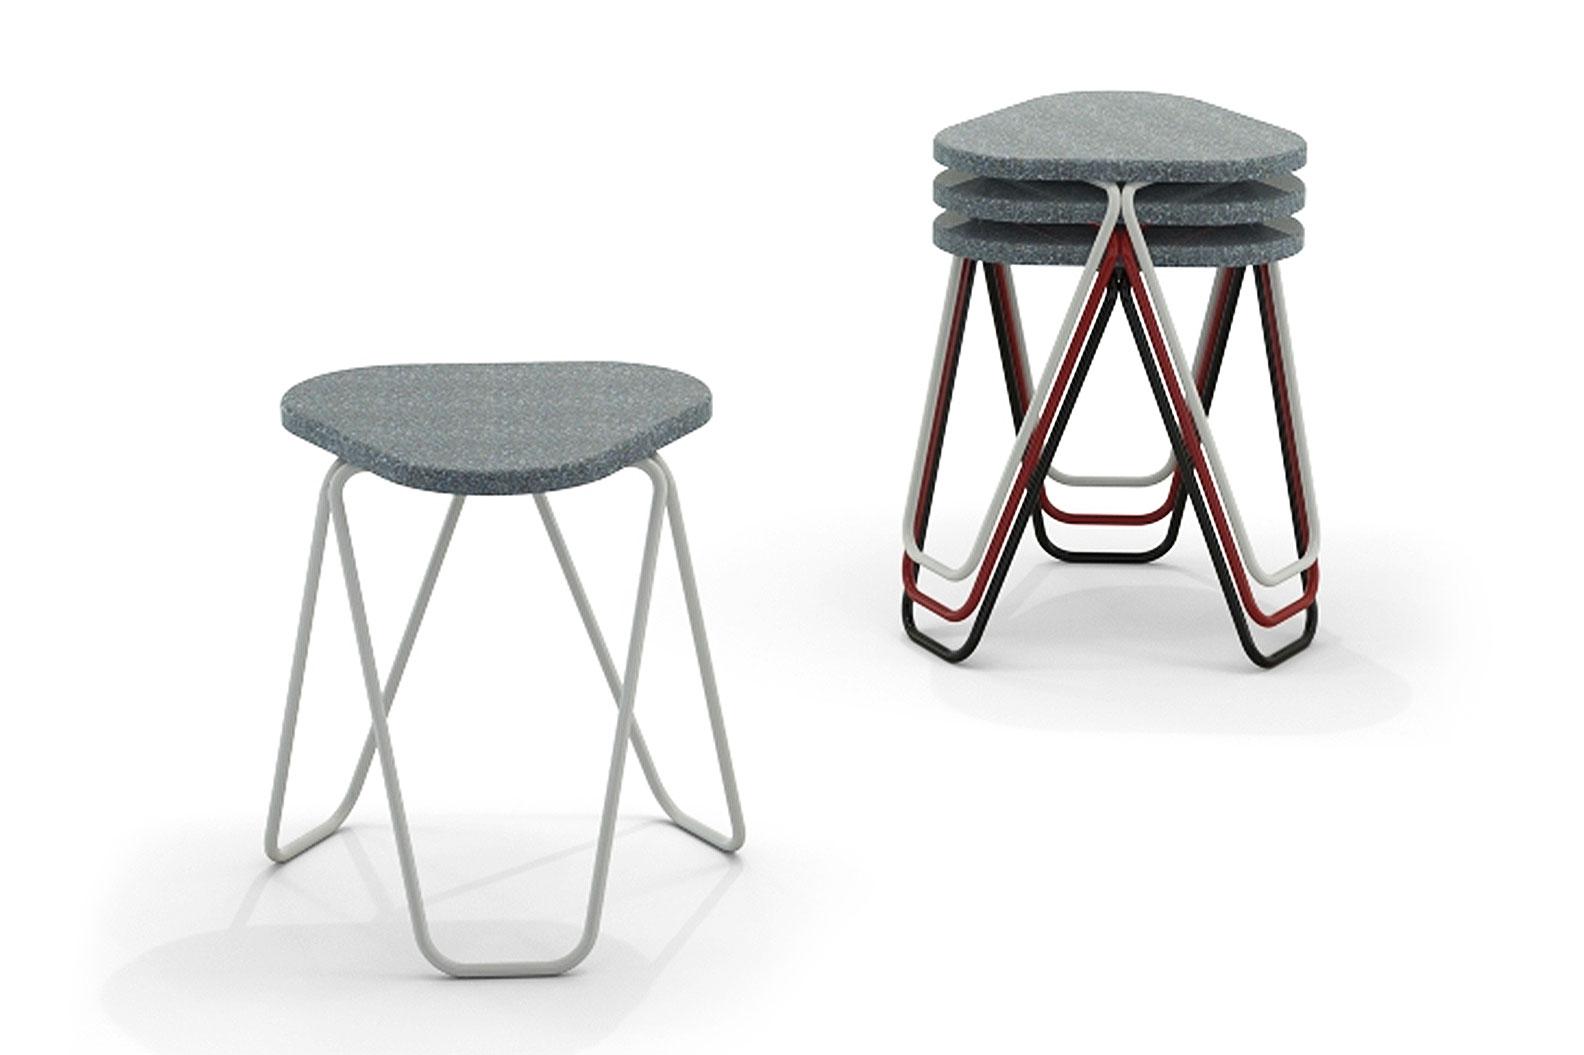 2017-Web-stools-trilobe-1